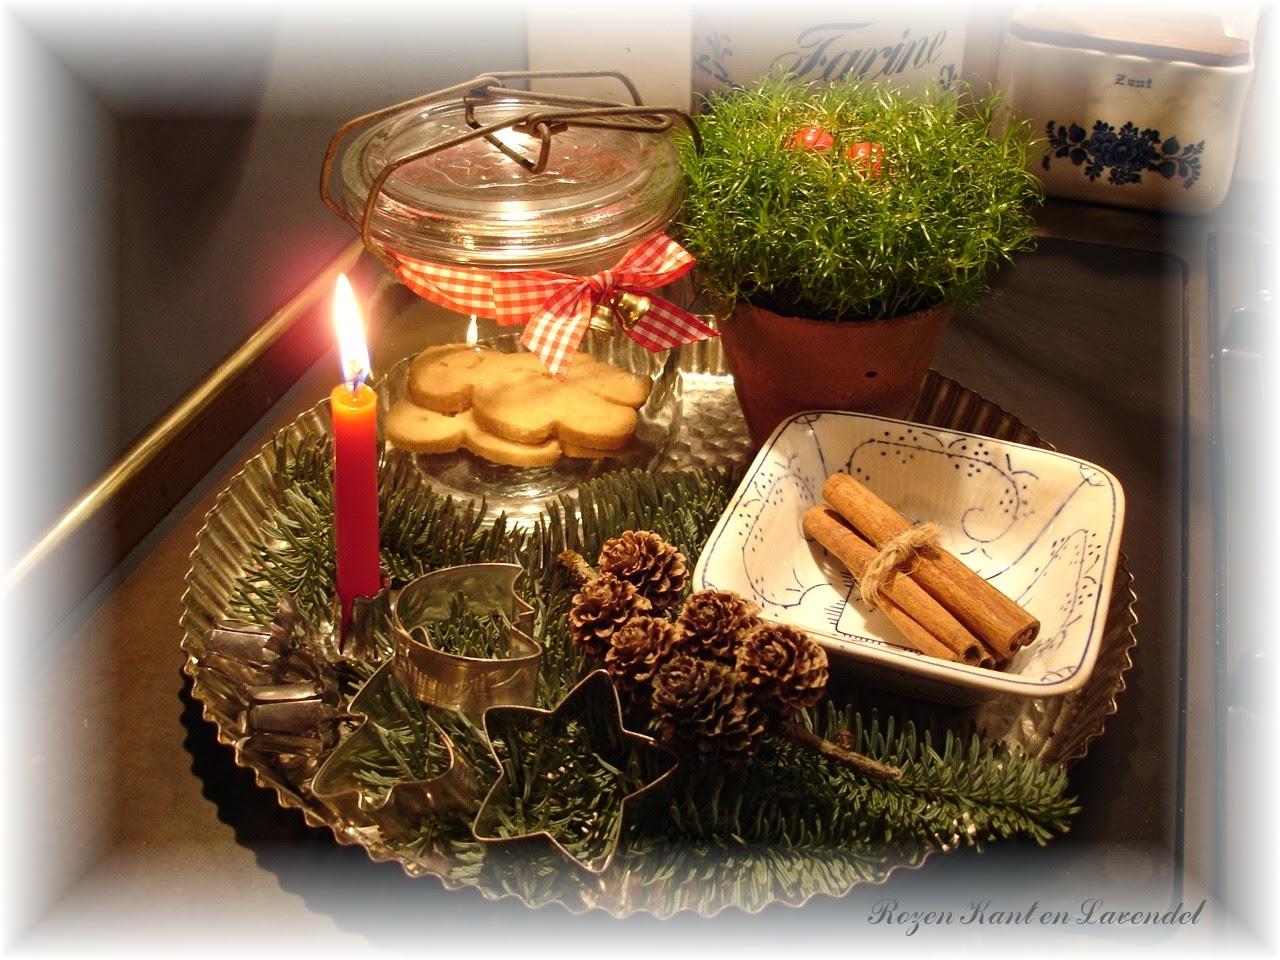 Rozen   kant en lavendel: december 2013